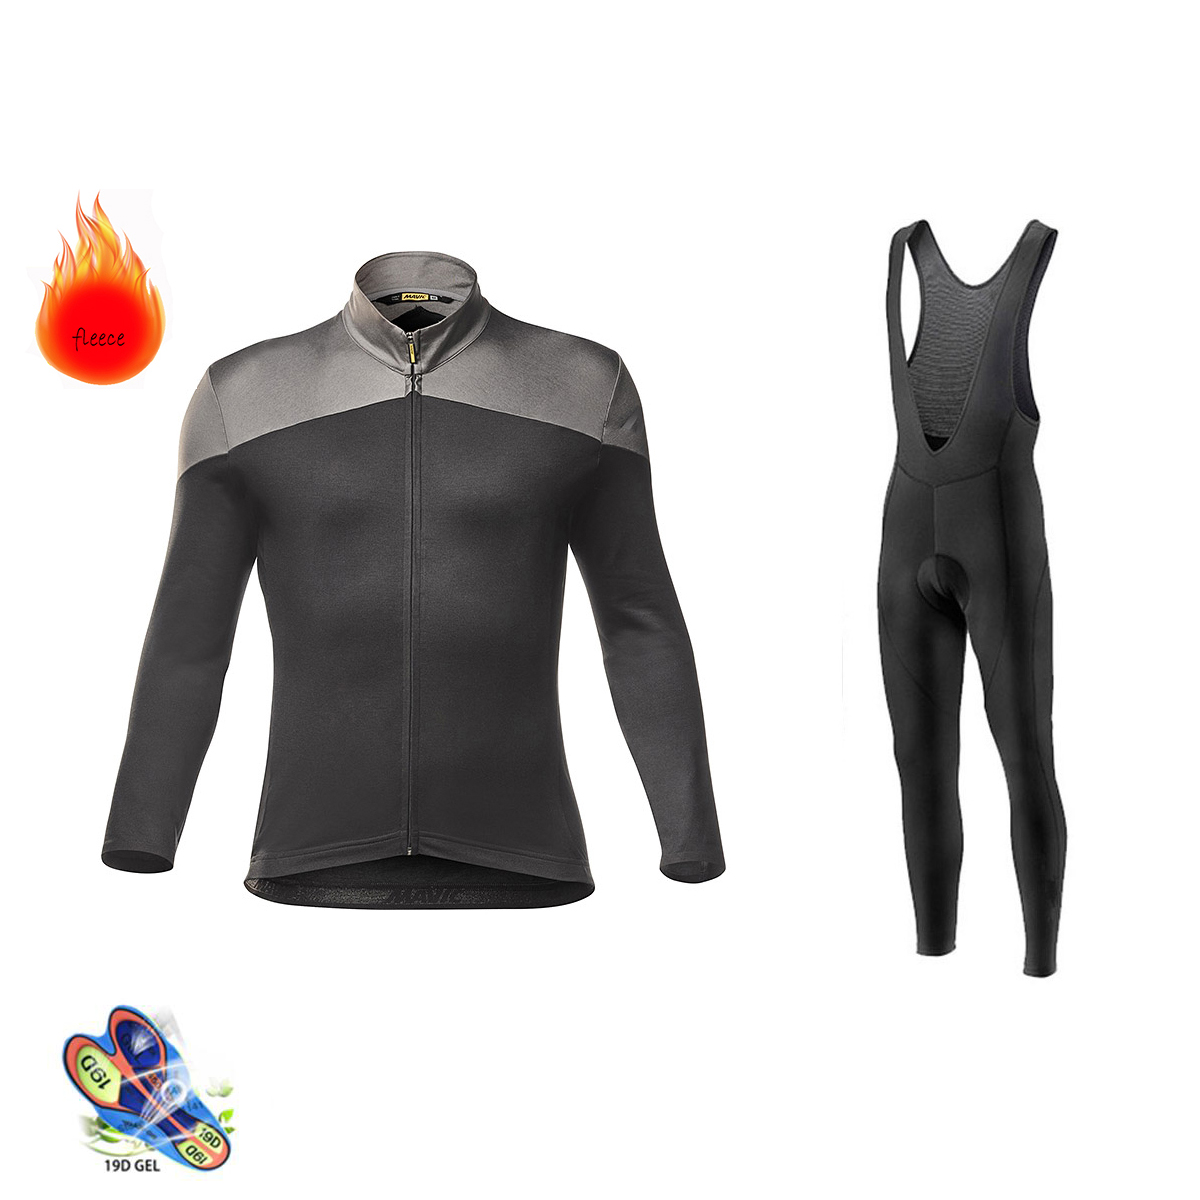 2019 Mavic Pro team Winter Long Sleeve Cycling Jersey Set MTB Bike Clothing Uniform Thermal Fleece Bicycle Maillot Ropa Ciclismo